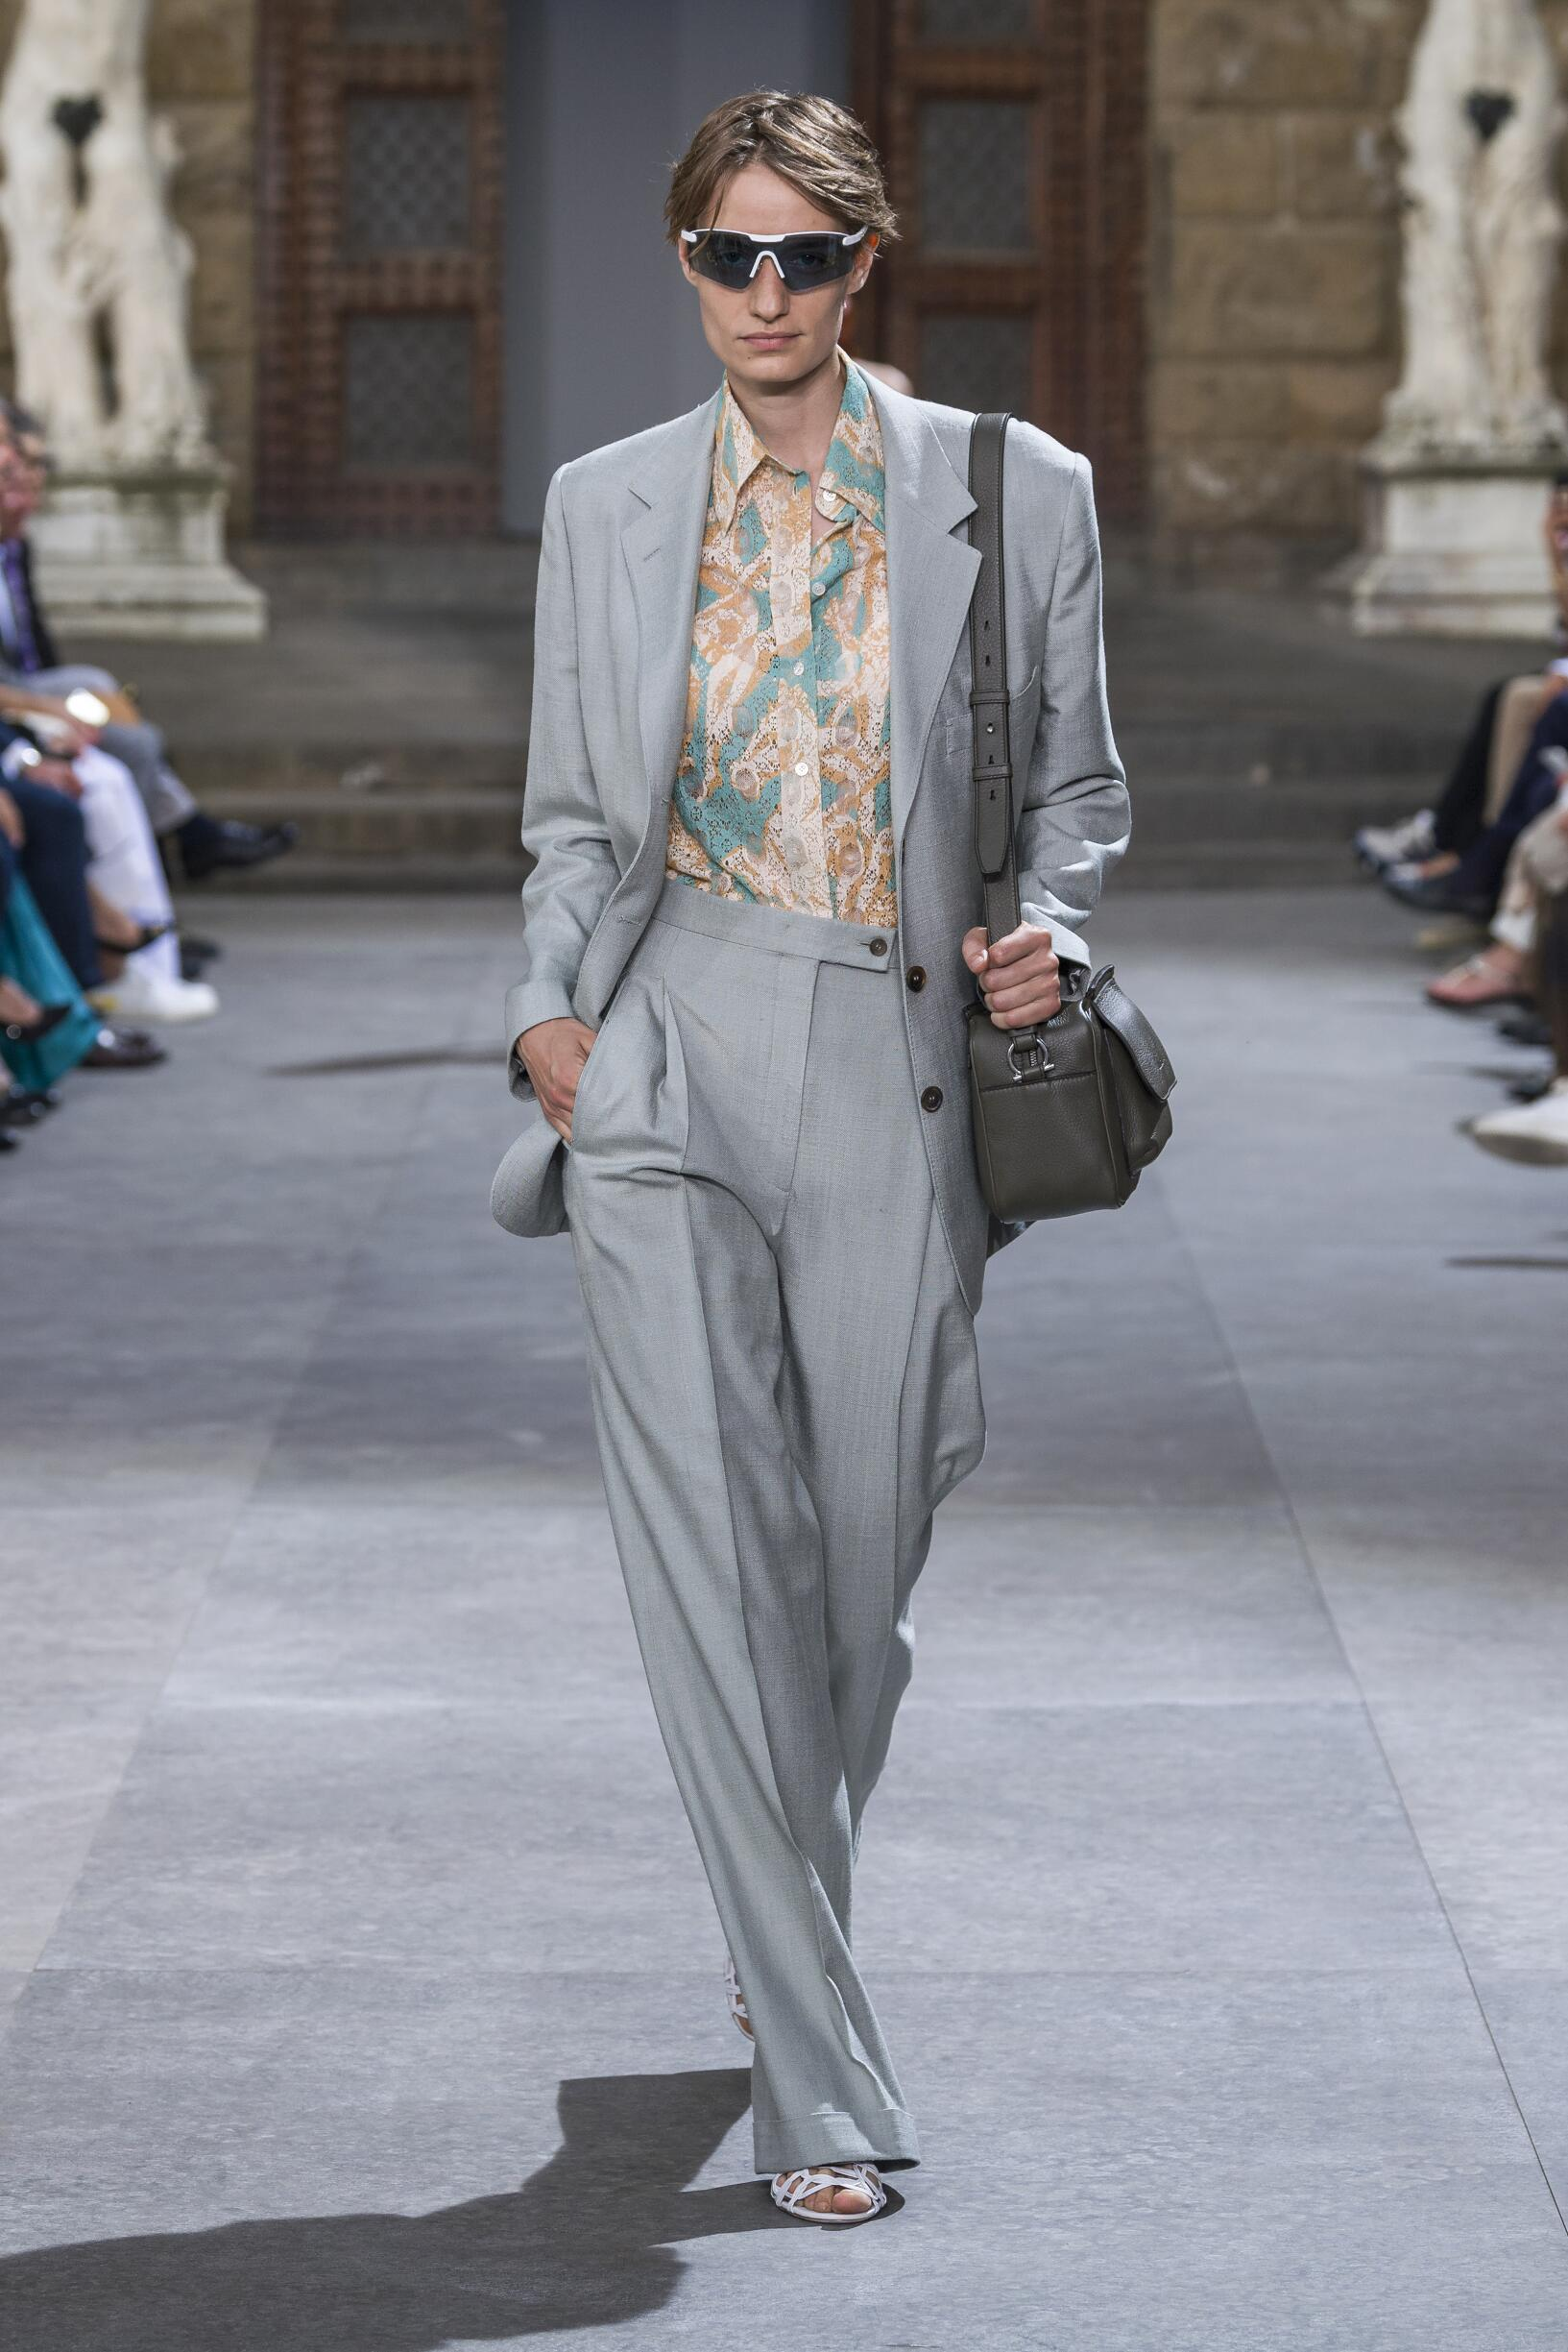 Spring Summer Fashion Trends 2020 Salvatore Ferragamo